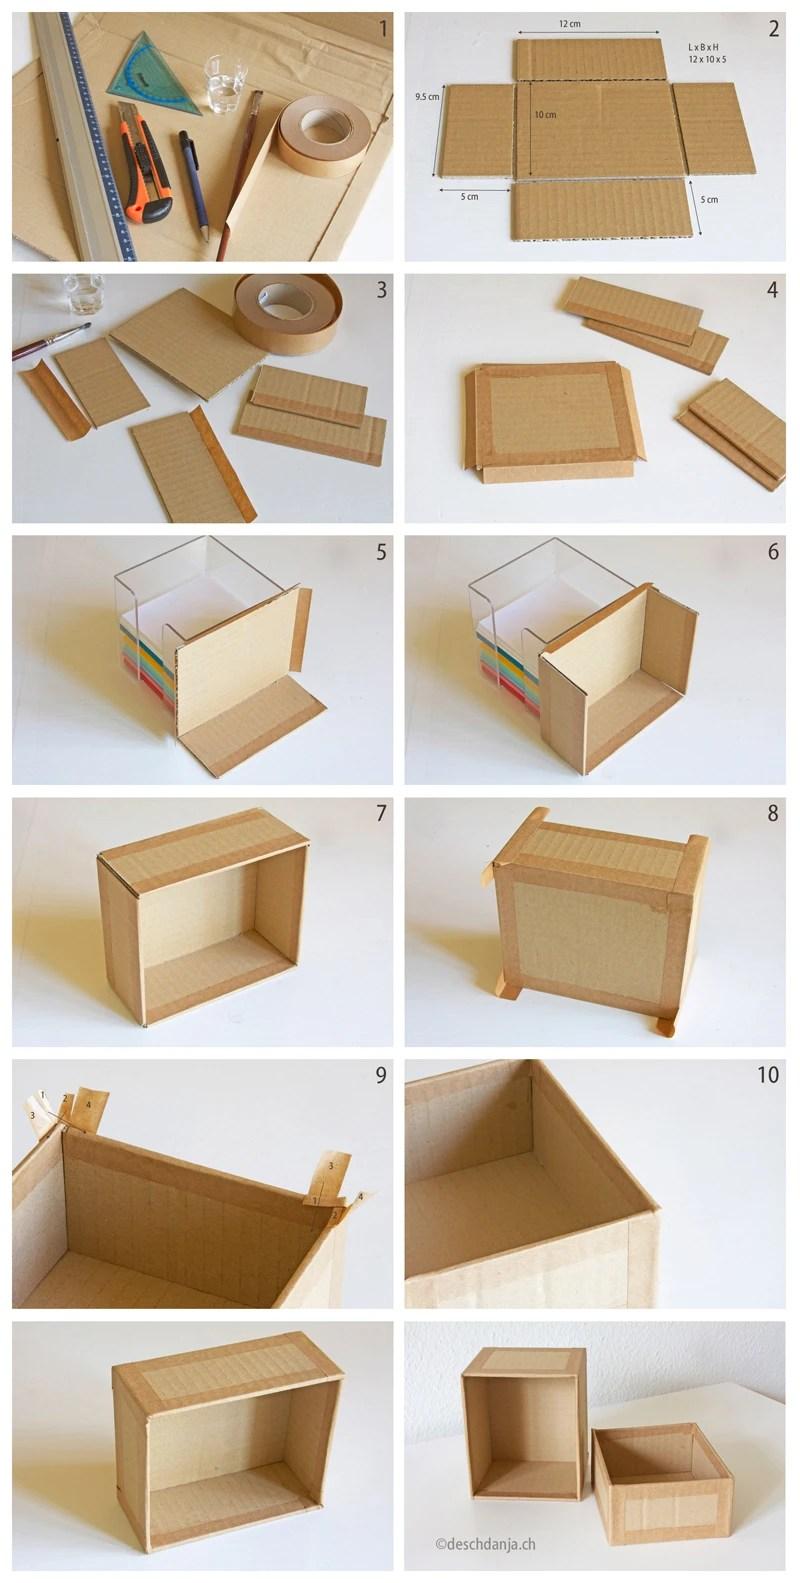 Cara Membuat Kotak Kemasan : membuat, kotak, kemasan, Membuat, Kotak, Limbah, Kardus